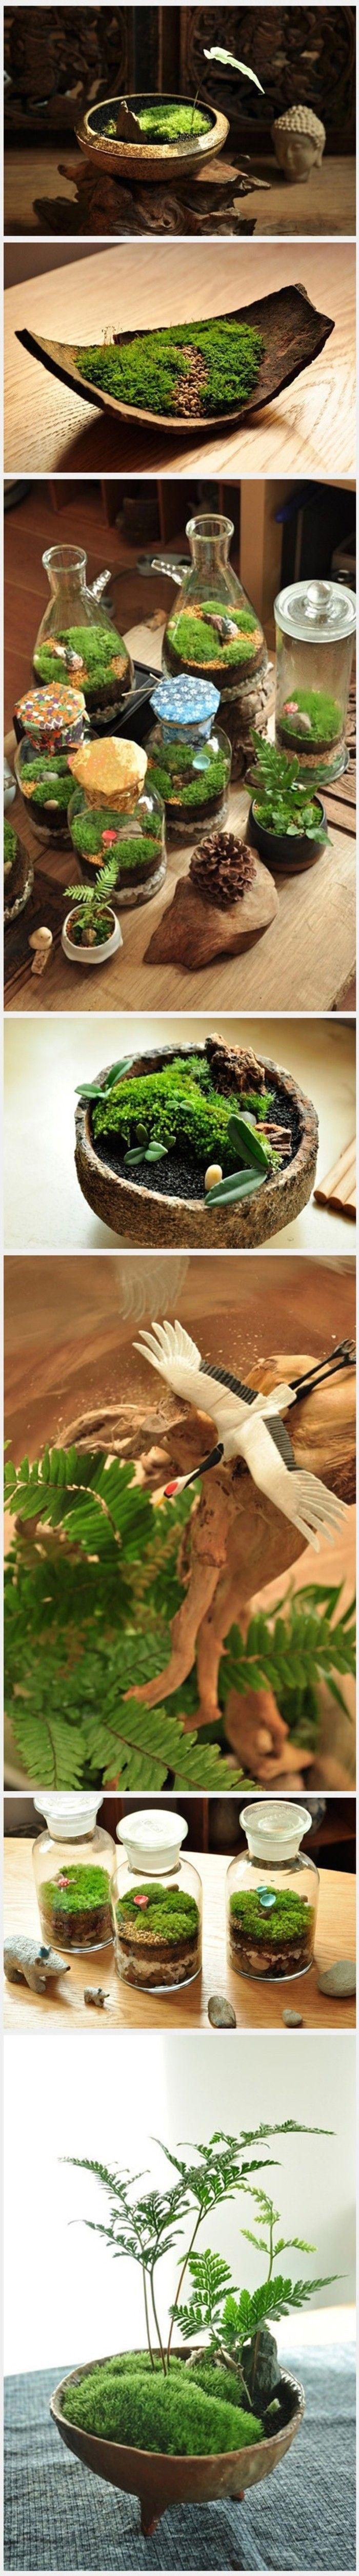 Miniature pot wood and plants succulents